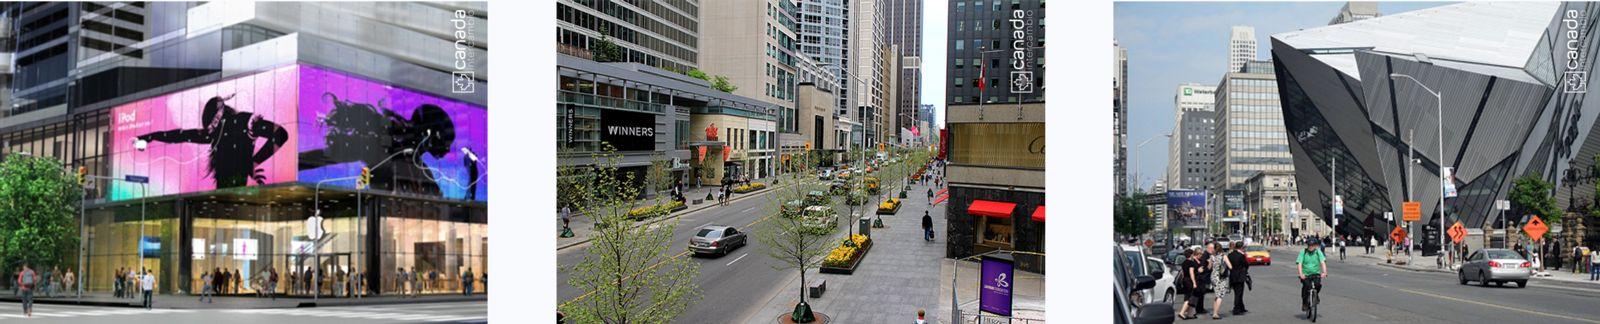 Bloor, rua famosa de Toronto